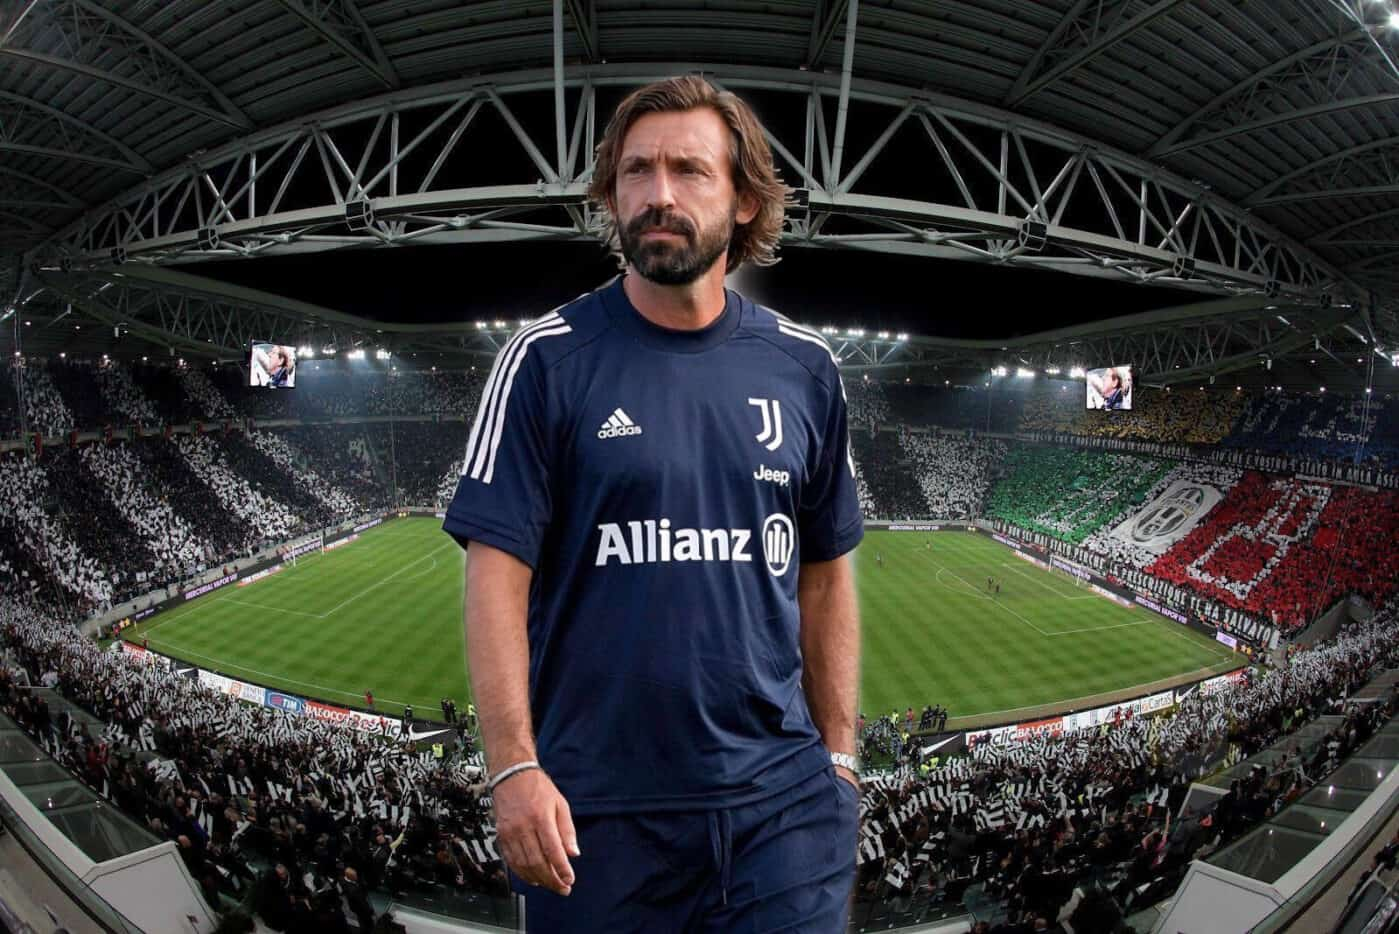 Juventus SPAL formazioni ufficiali, maxi turnover: Fagioli e Dragusin titolari